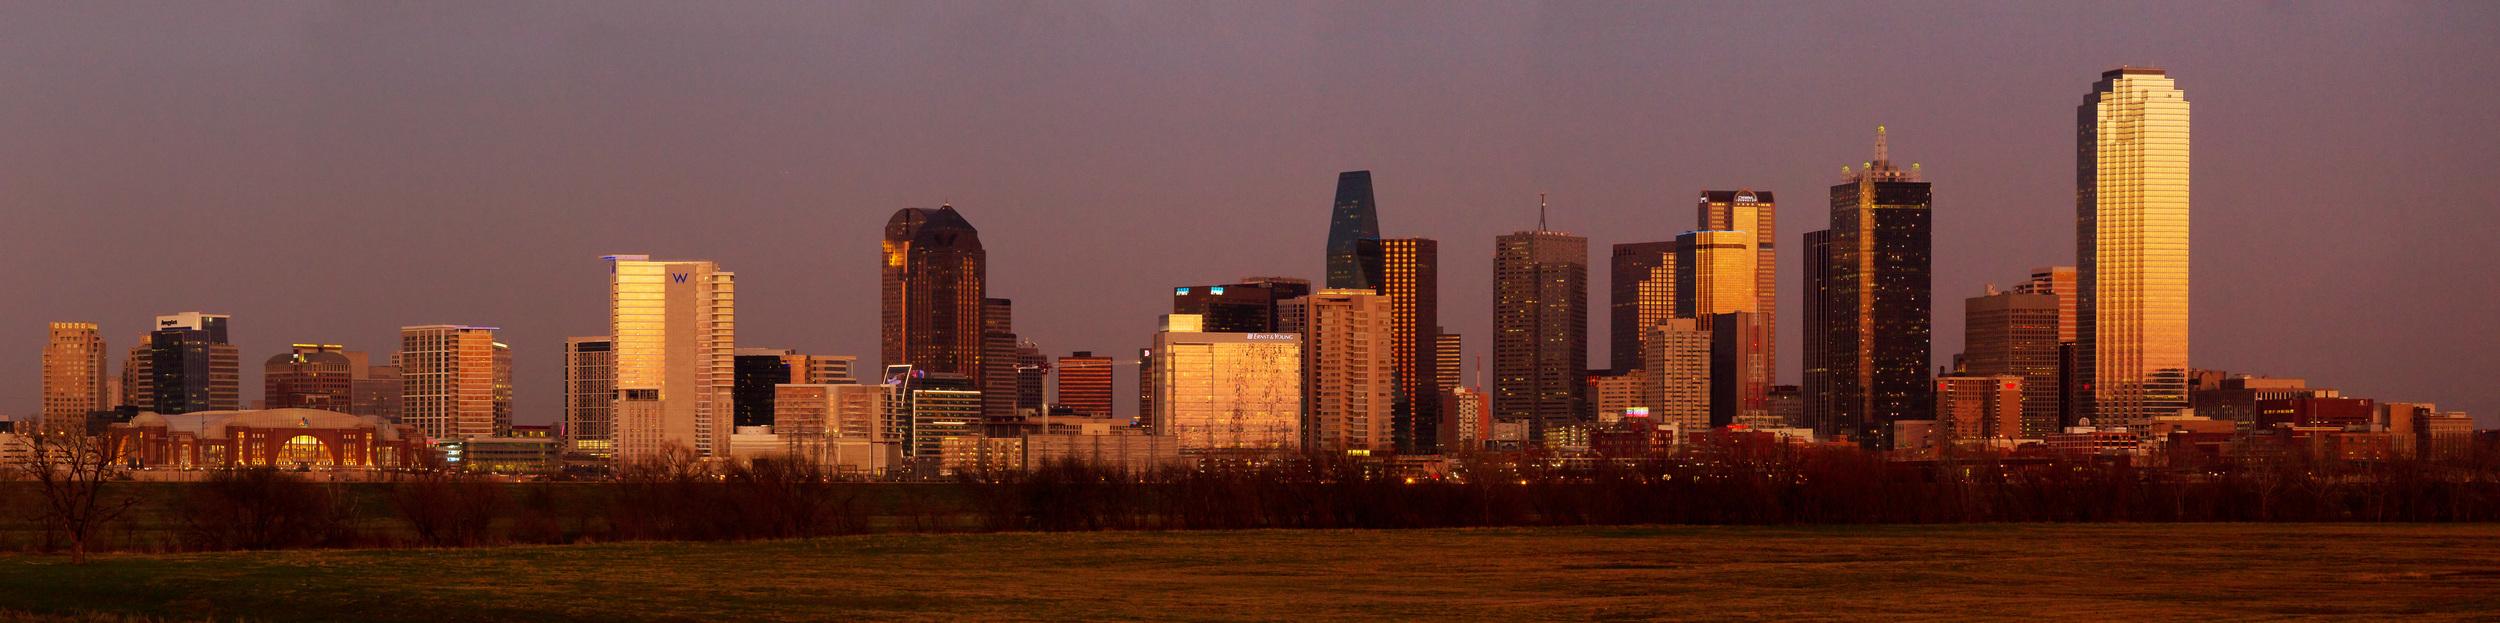 Dallas-Skyline-Pano-Short.jpg